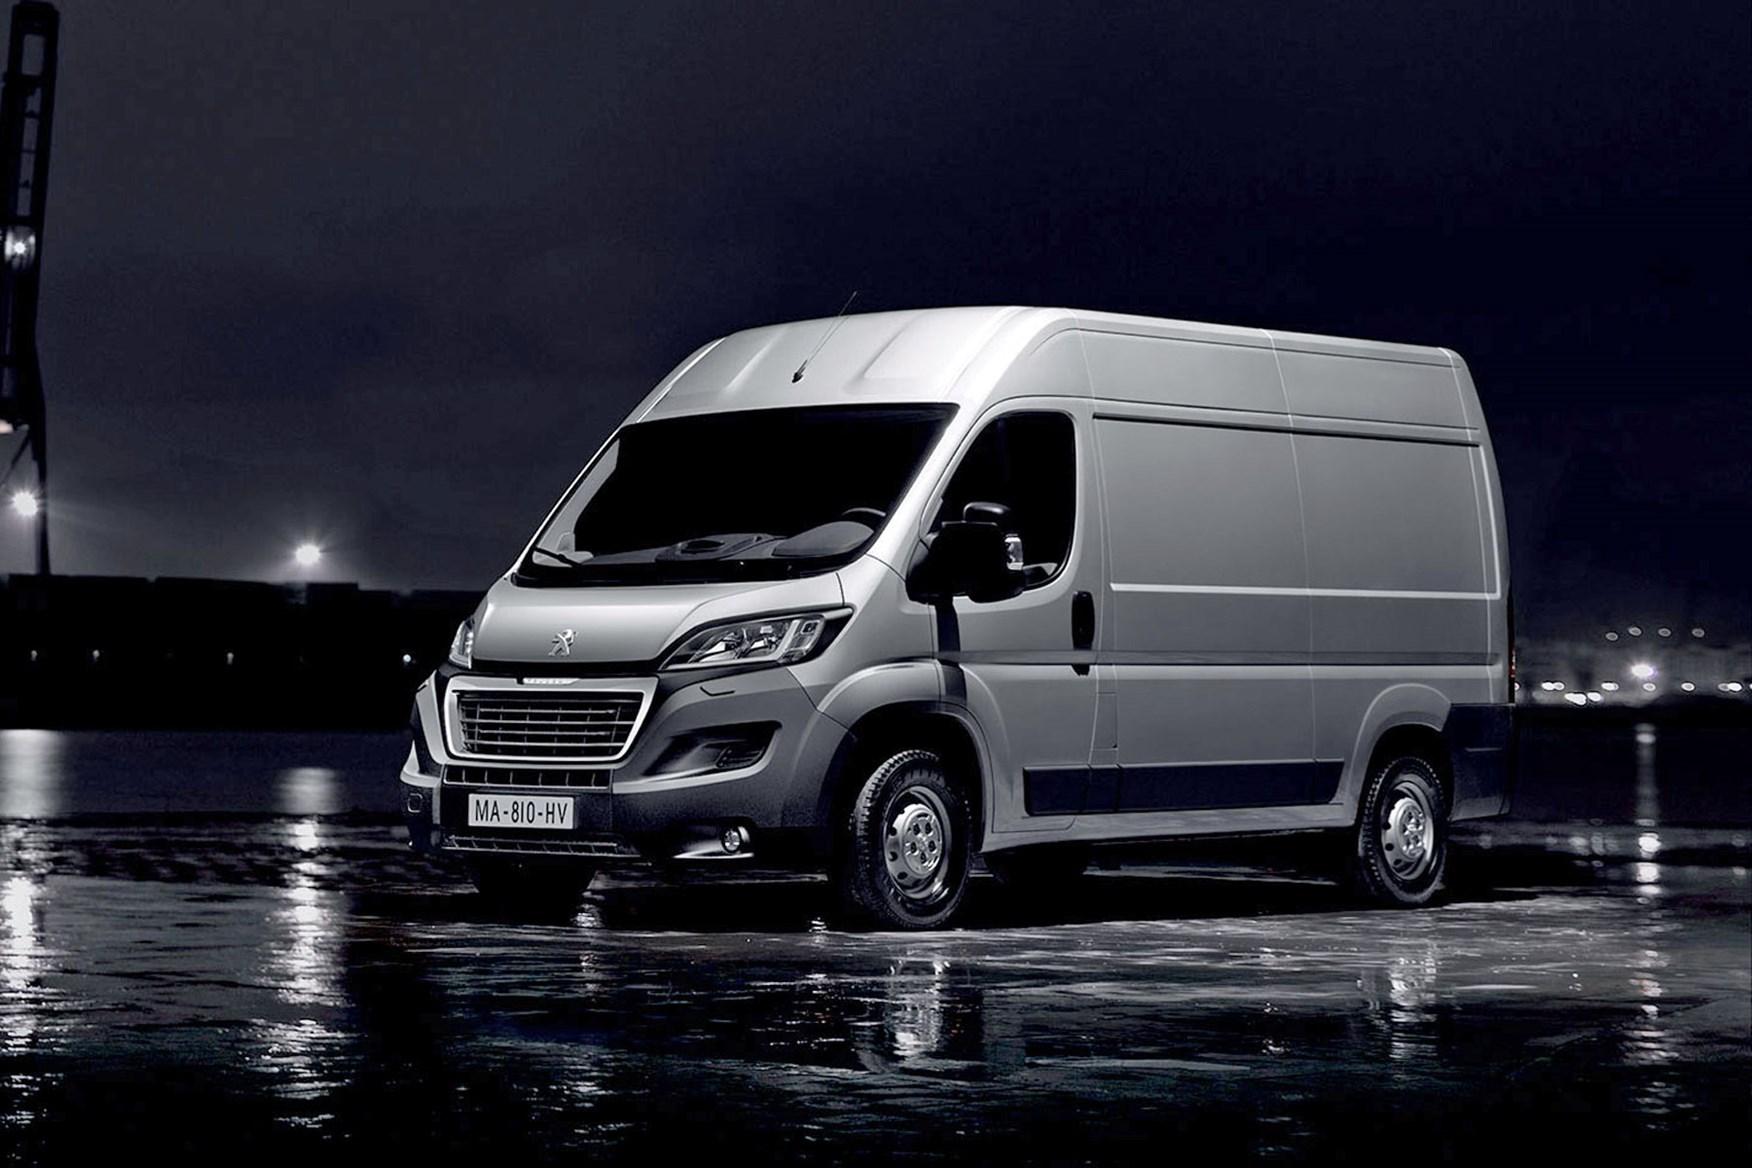 204807f16c ... Peugeot Boxer - best large 3.5t vans for payload ...